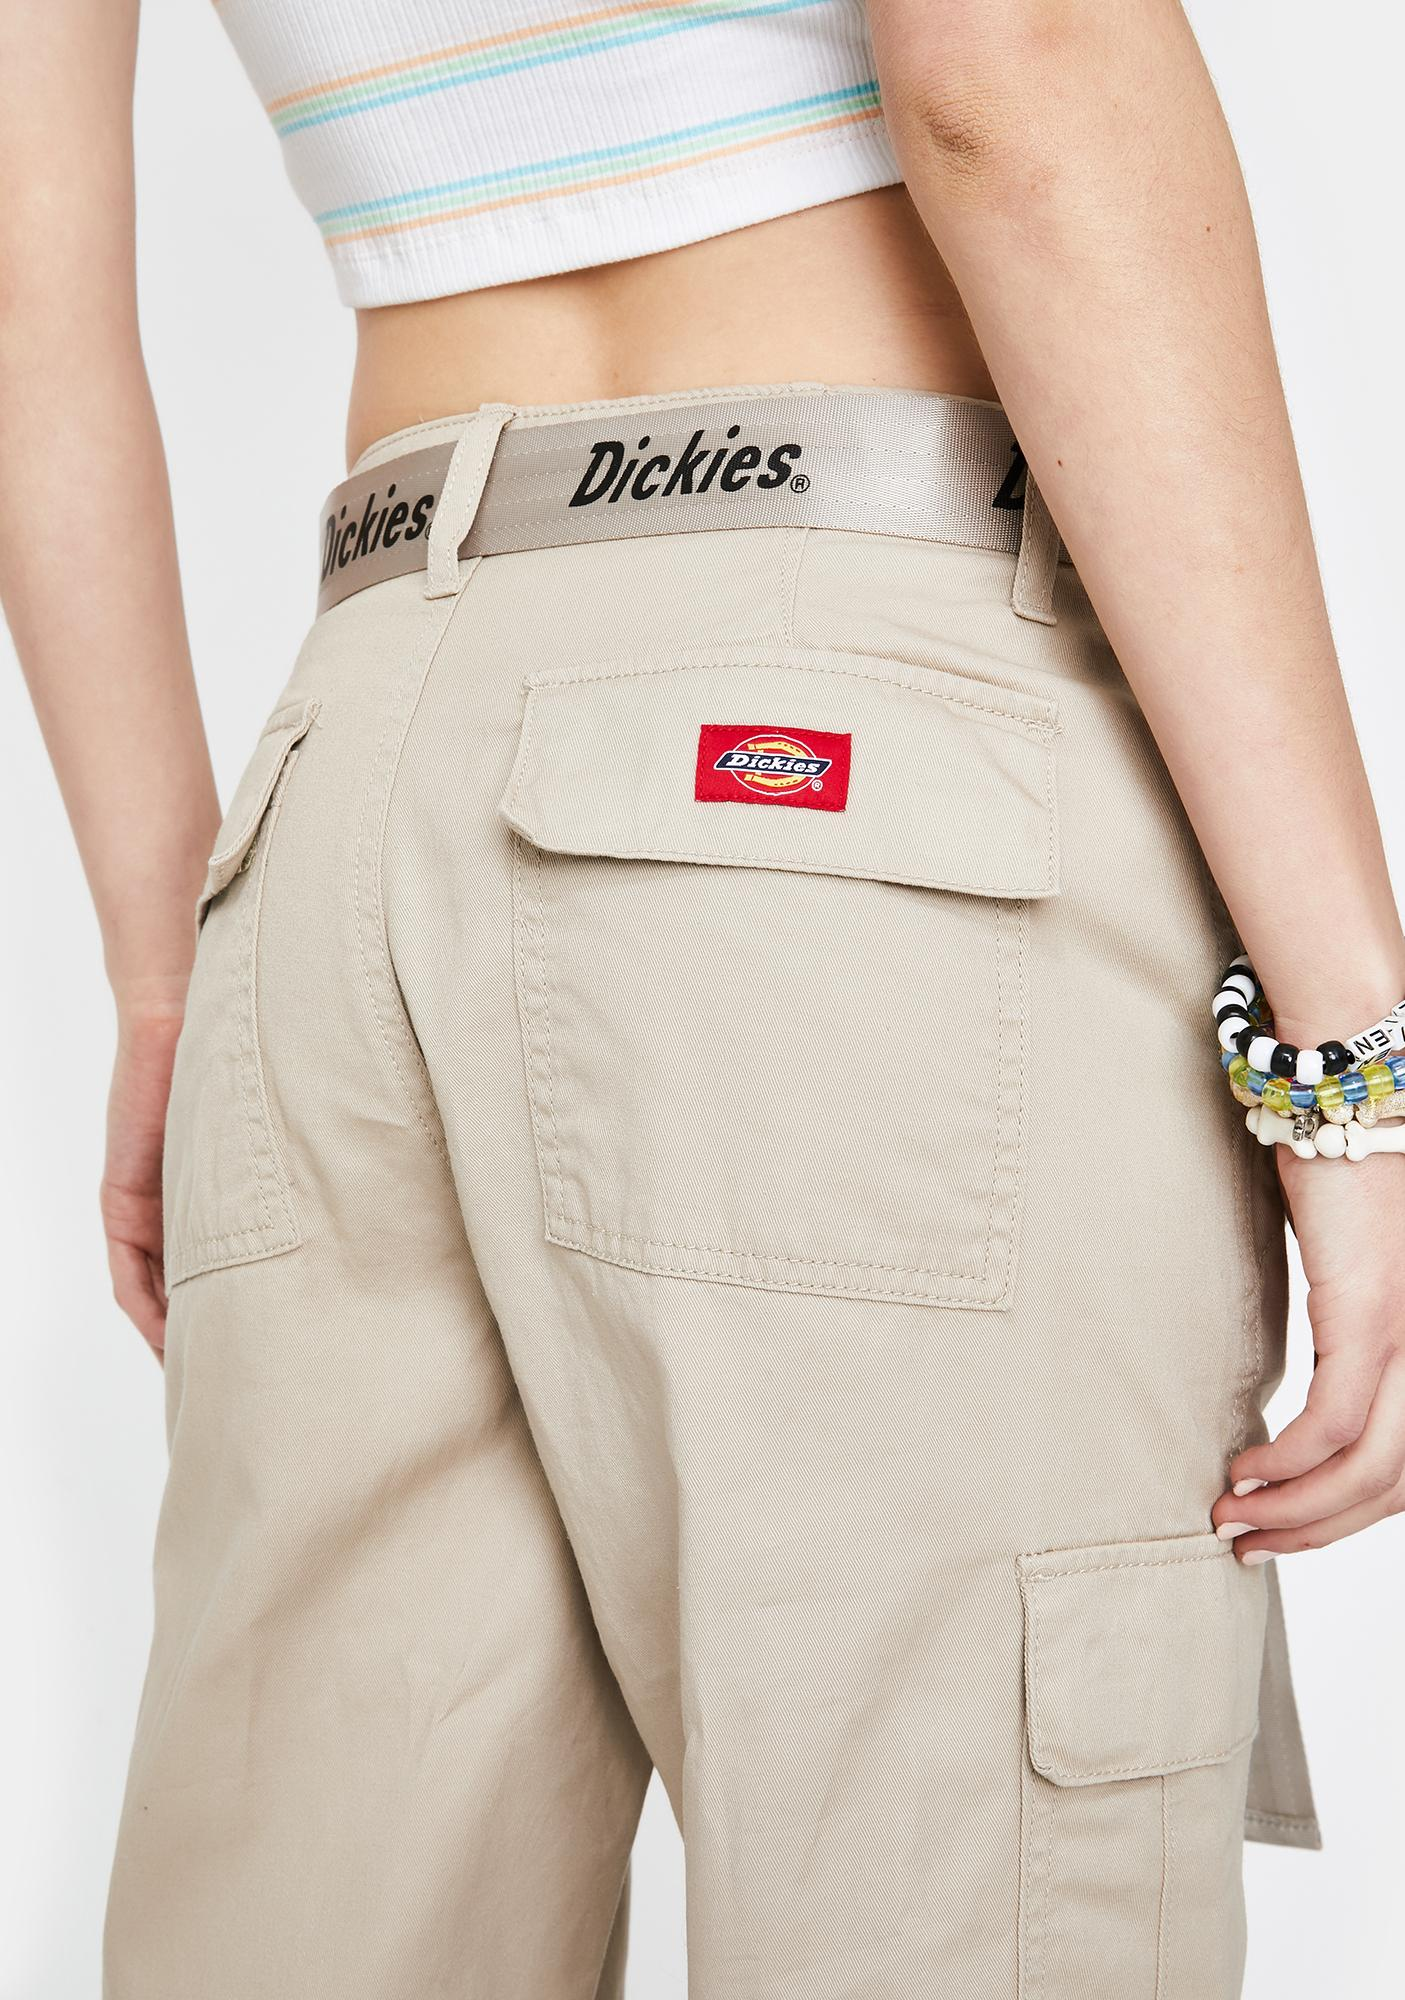 Dickies Girl Khaki Belted Cargo Pants